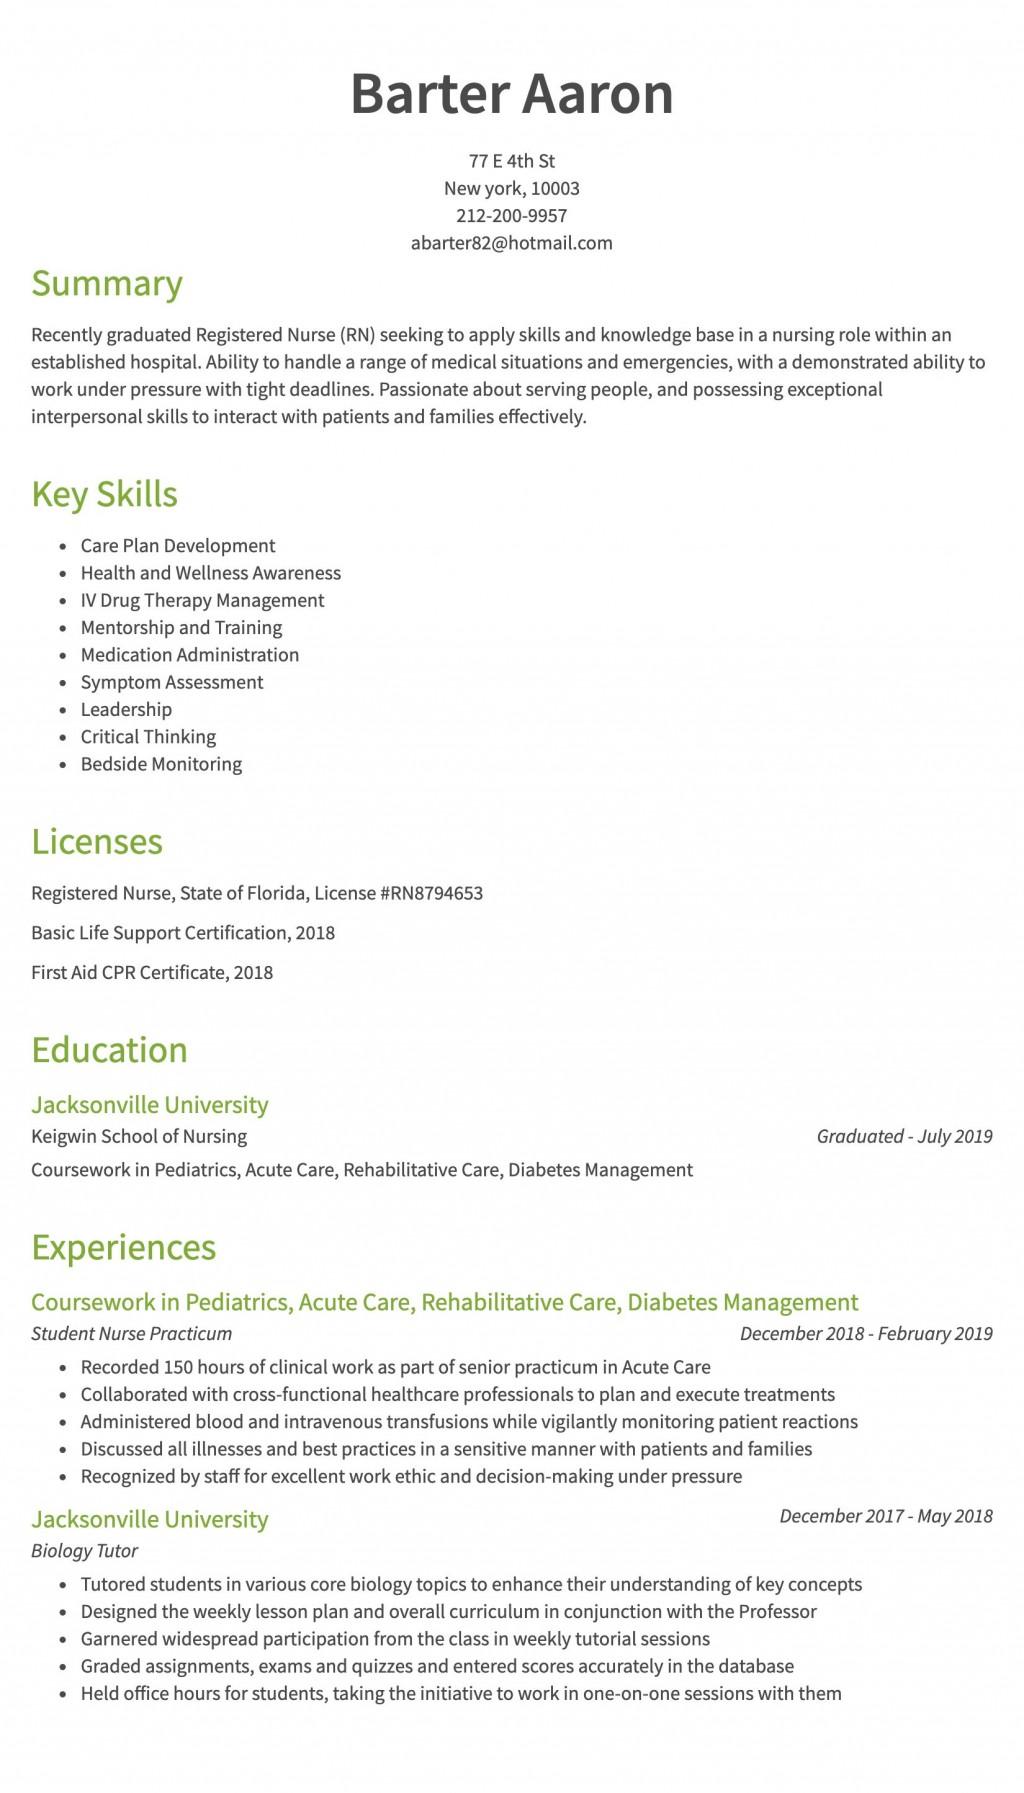 007 Striking Rn Graduate Resume Template High Resolution  New Grad NurseLarge